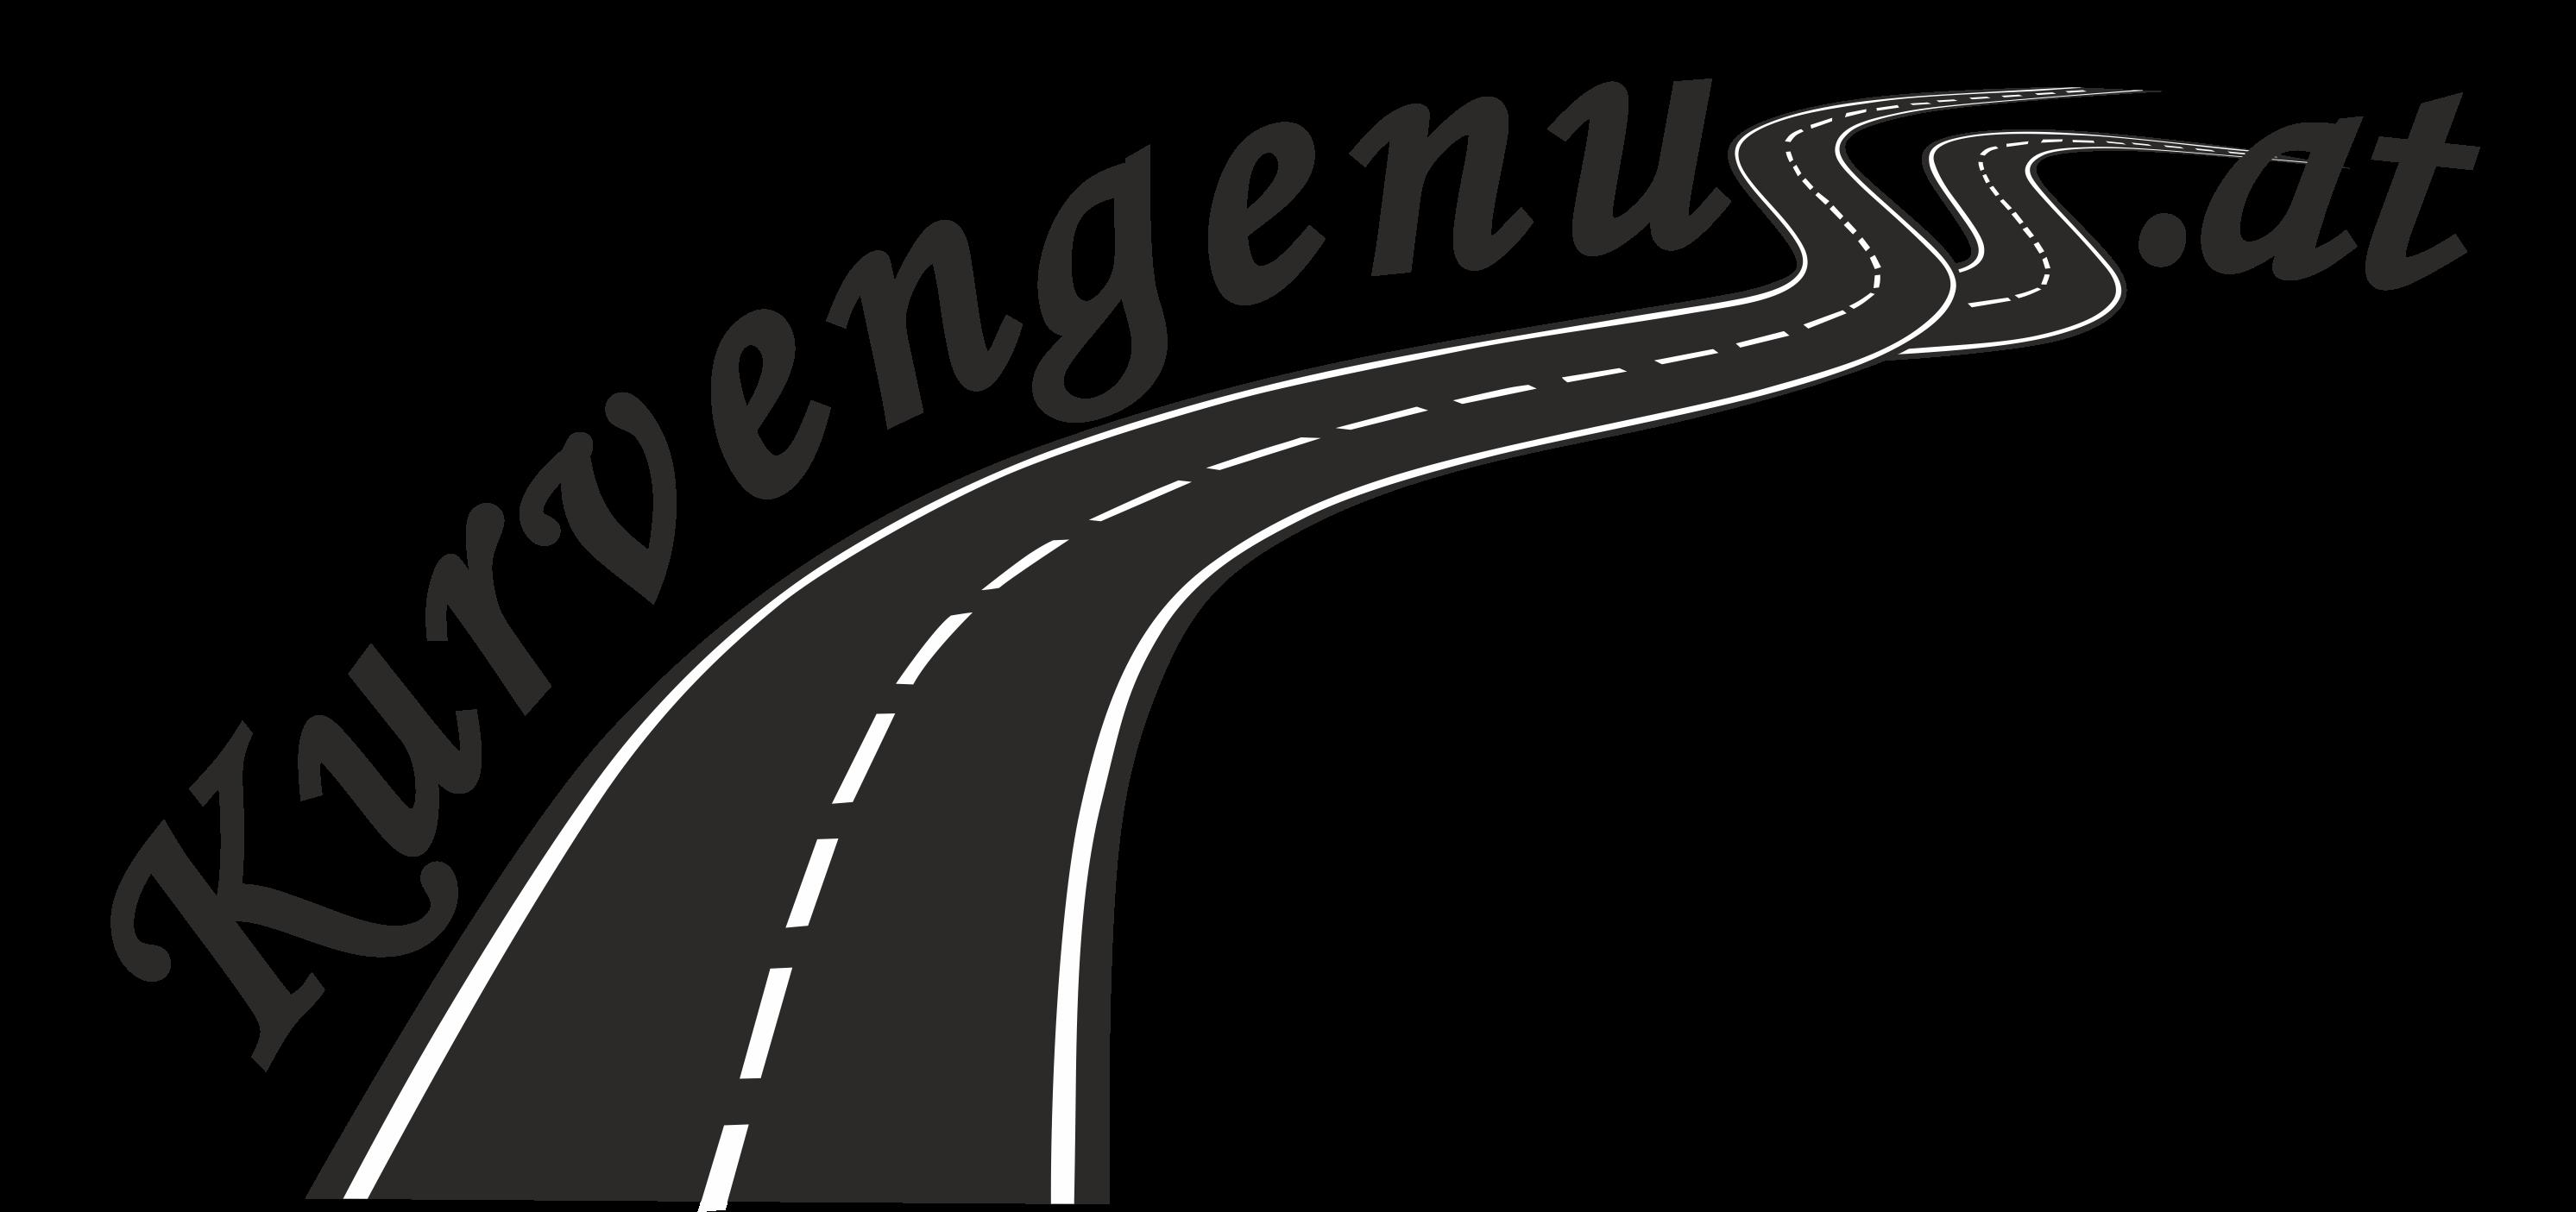 www.Kurvengenuss.at